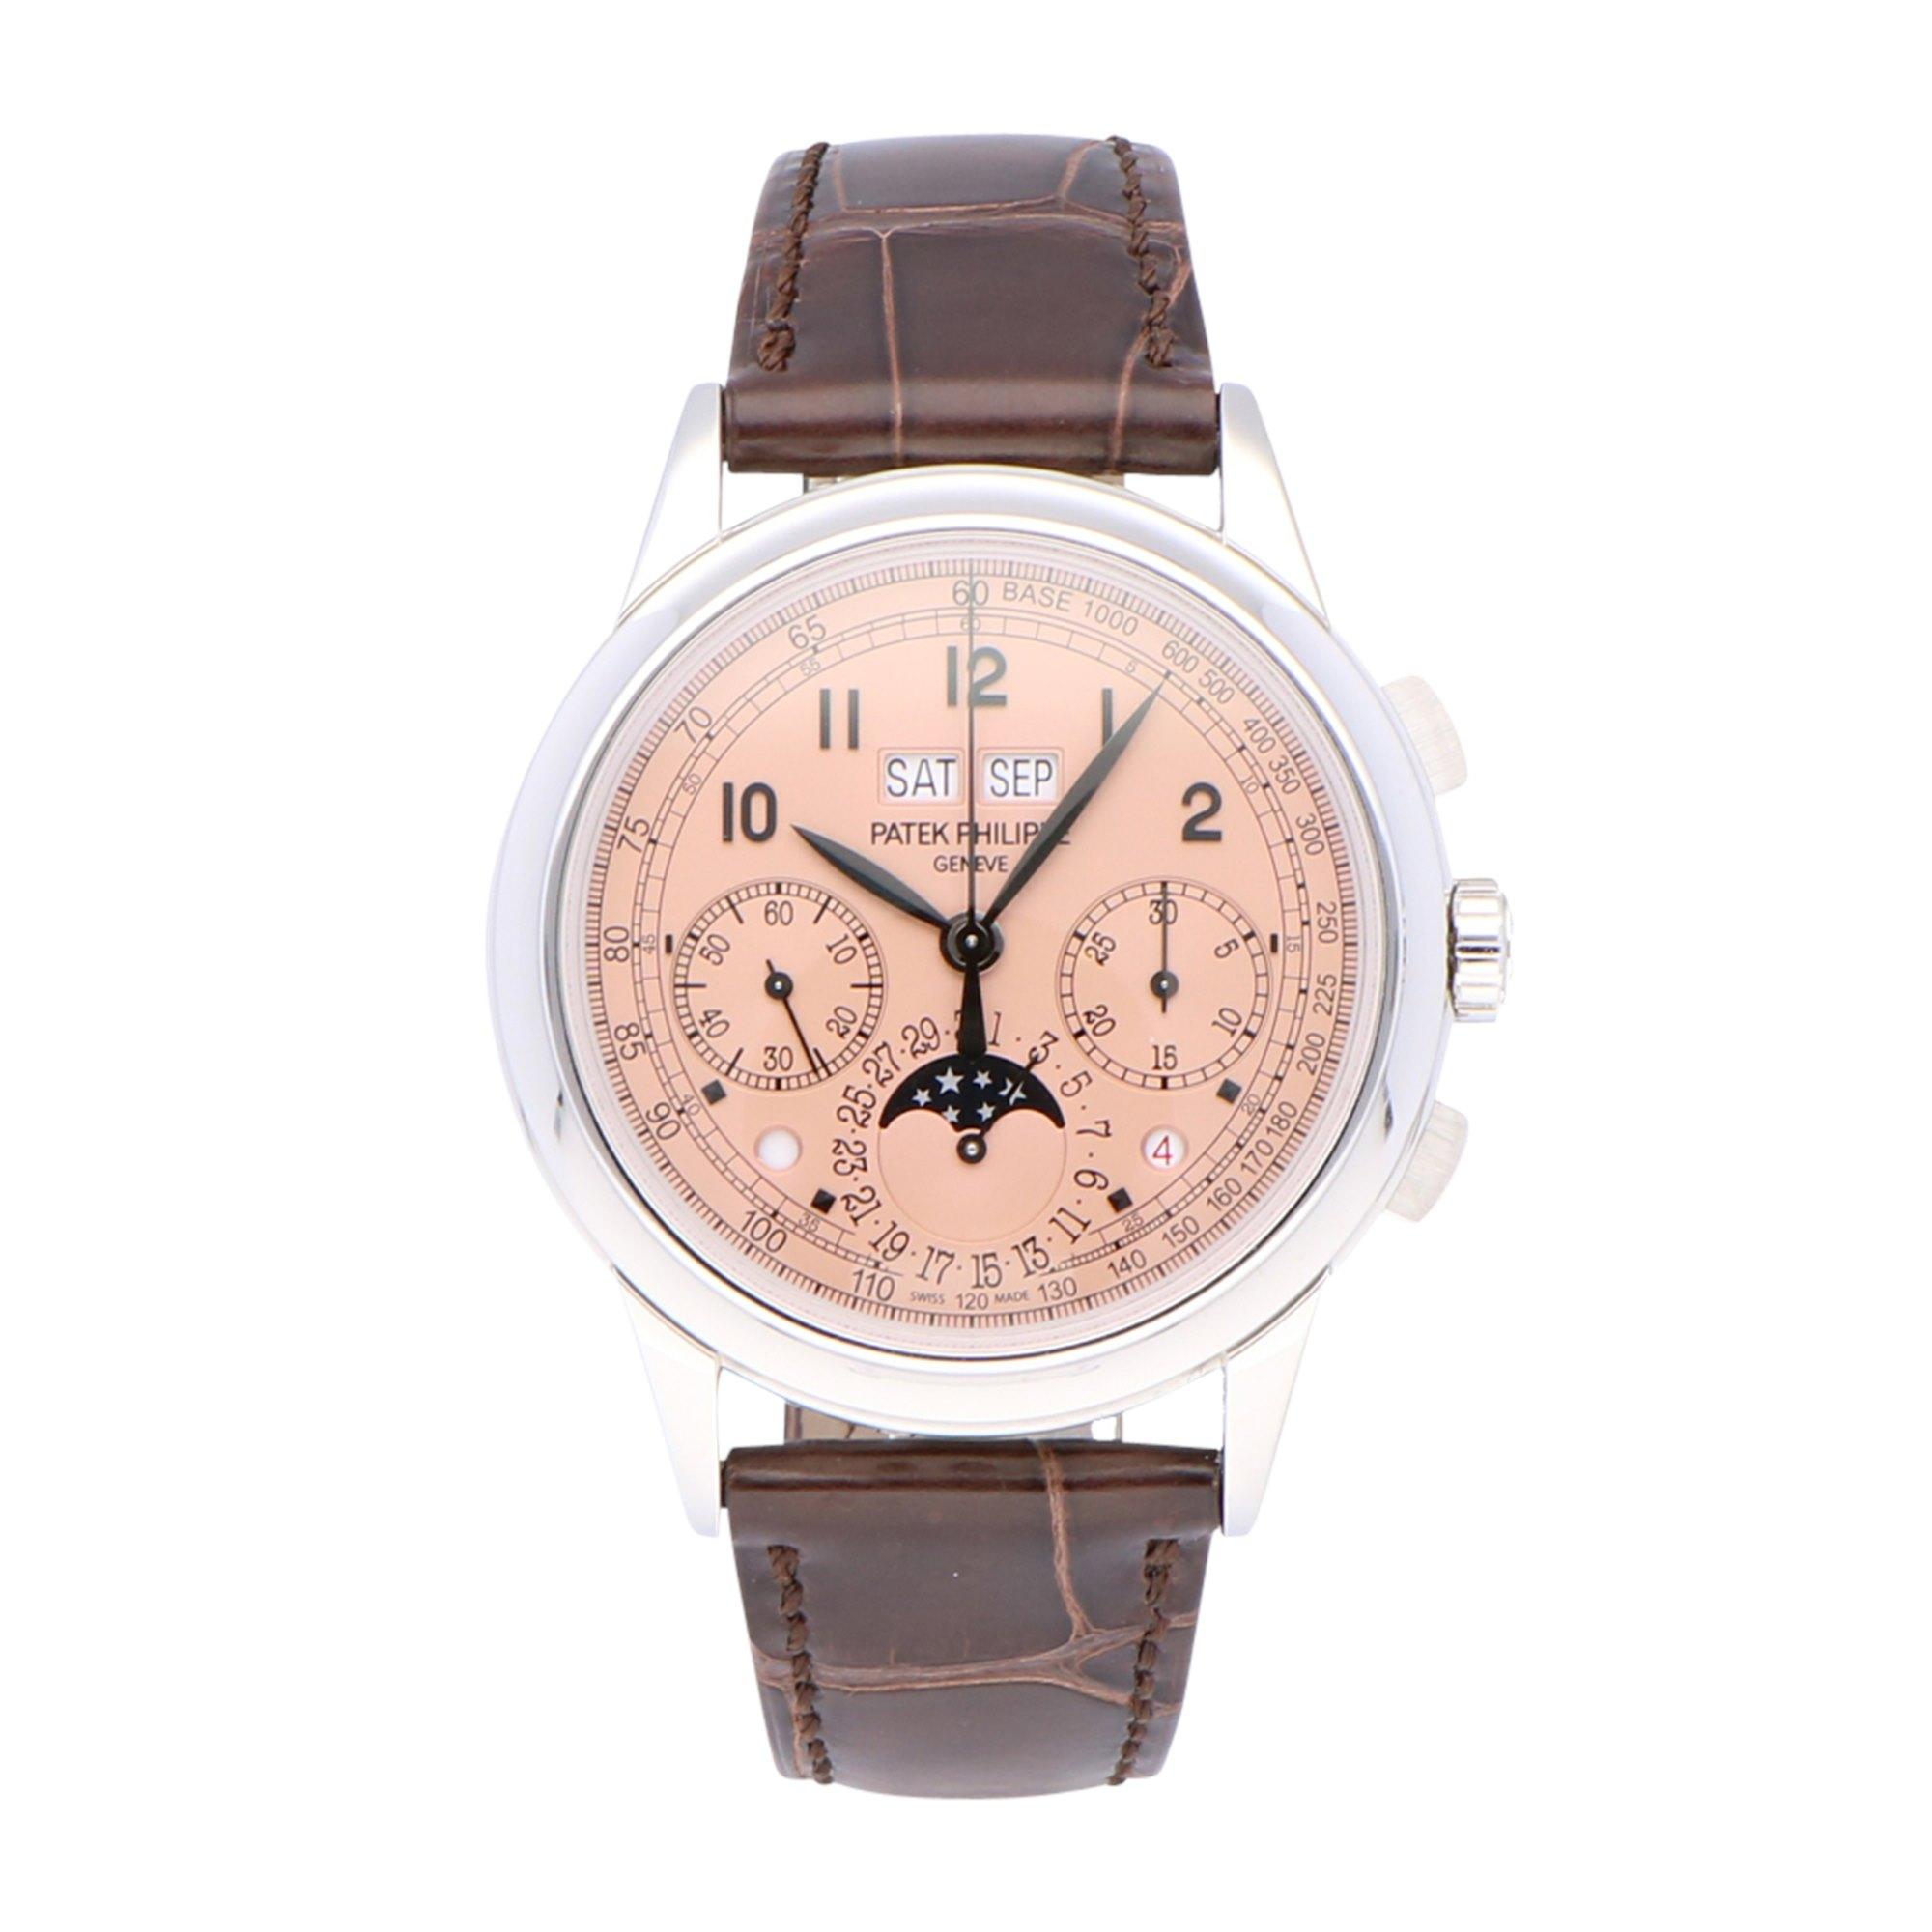 Patek Philippe Grand Complications Perpetual Calendar Chronograph 5270P-001